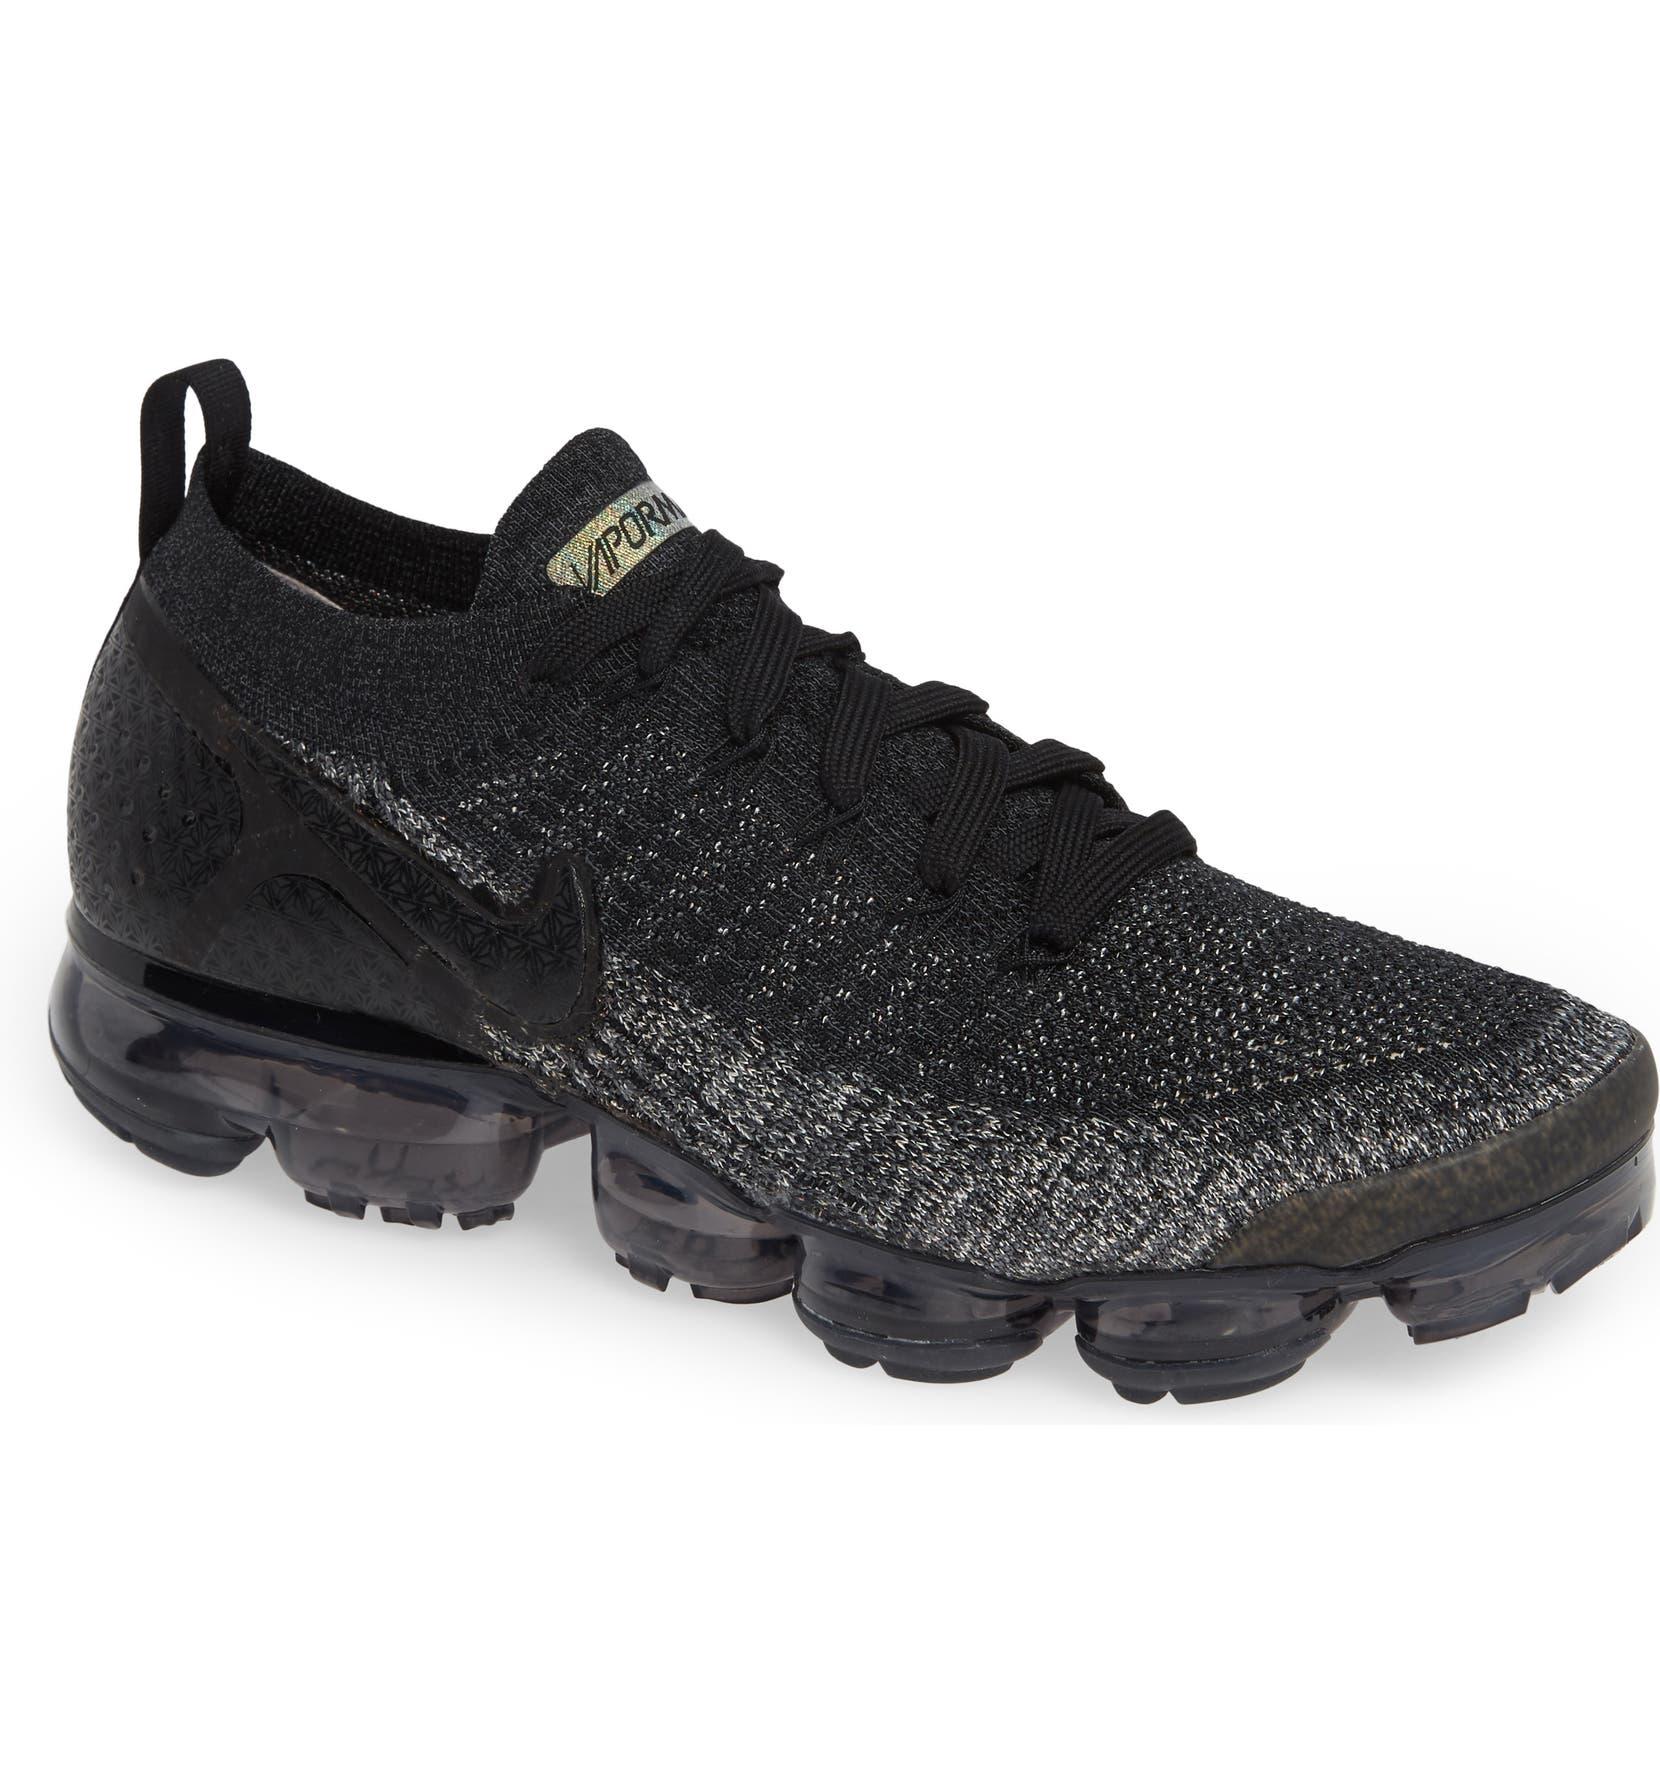 fd440c53c31f0 Nike Air VaporMax Flyknit 2 Running Shoe (Men)   Nordstrom